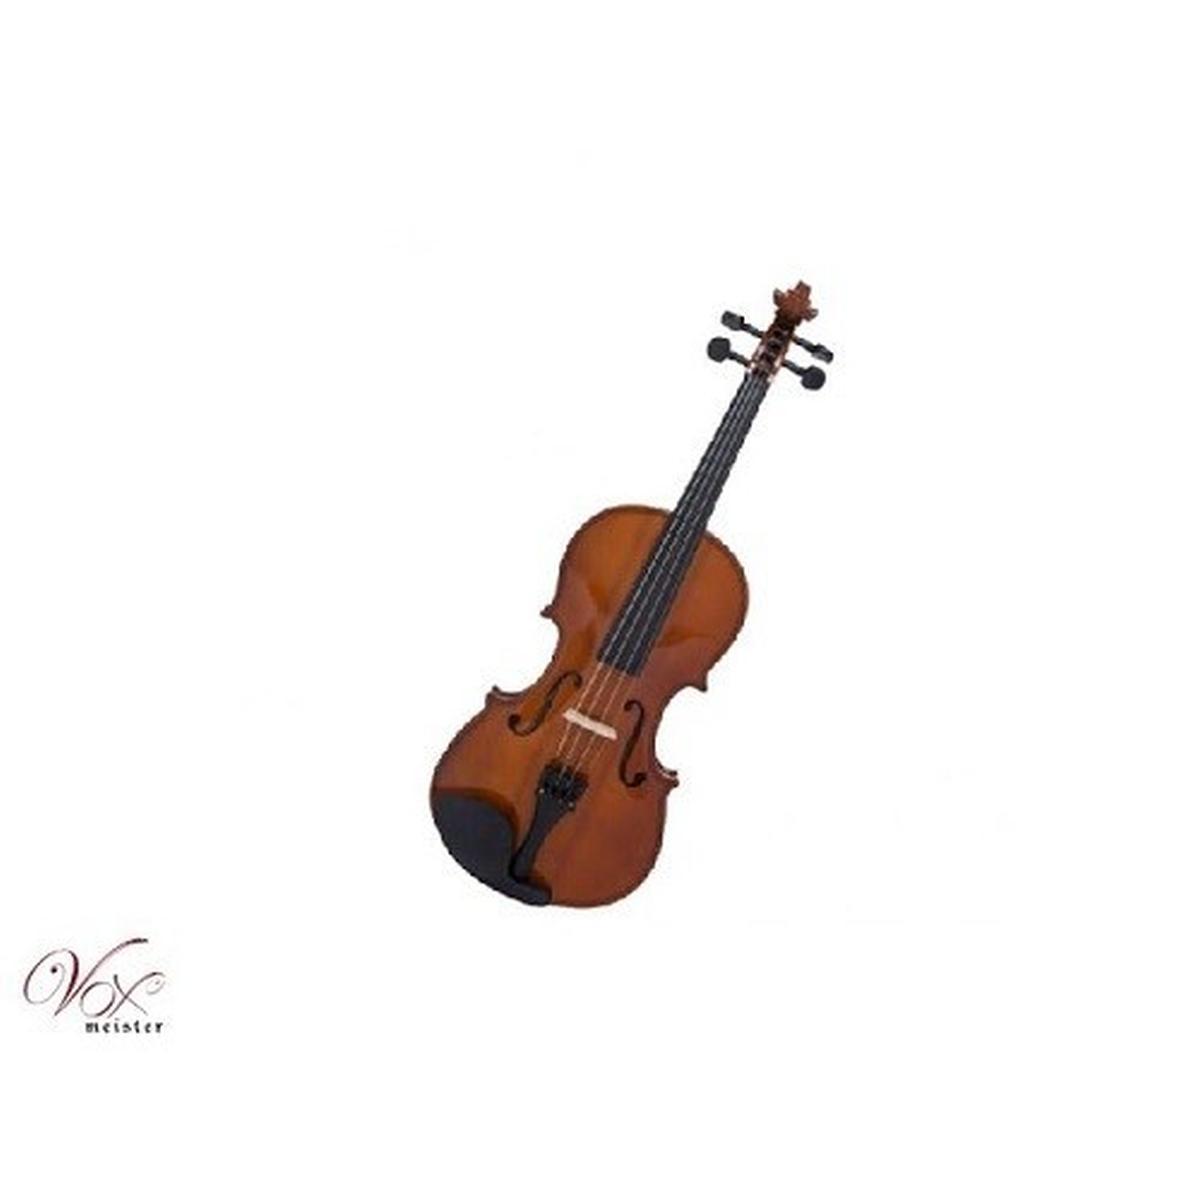 Vox meister vob18  violino 1/8 con astuccio